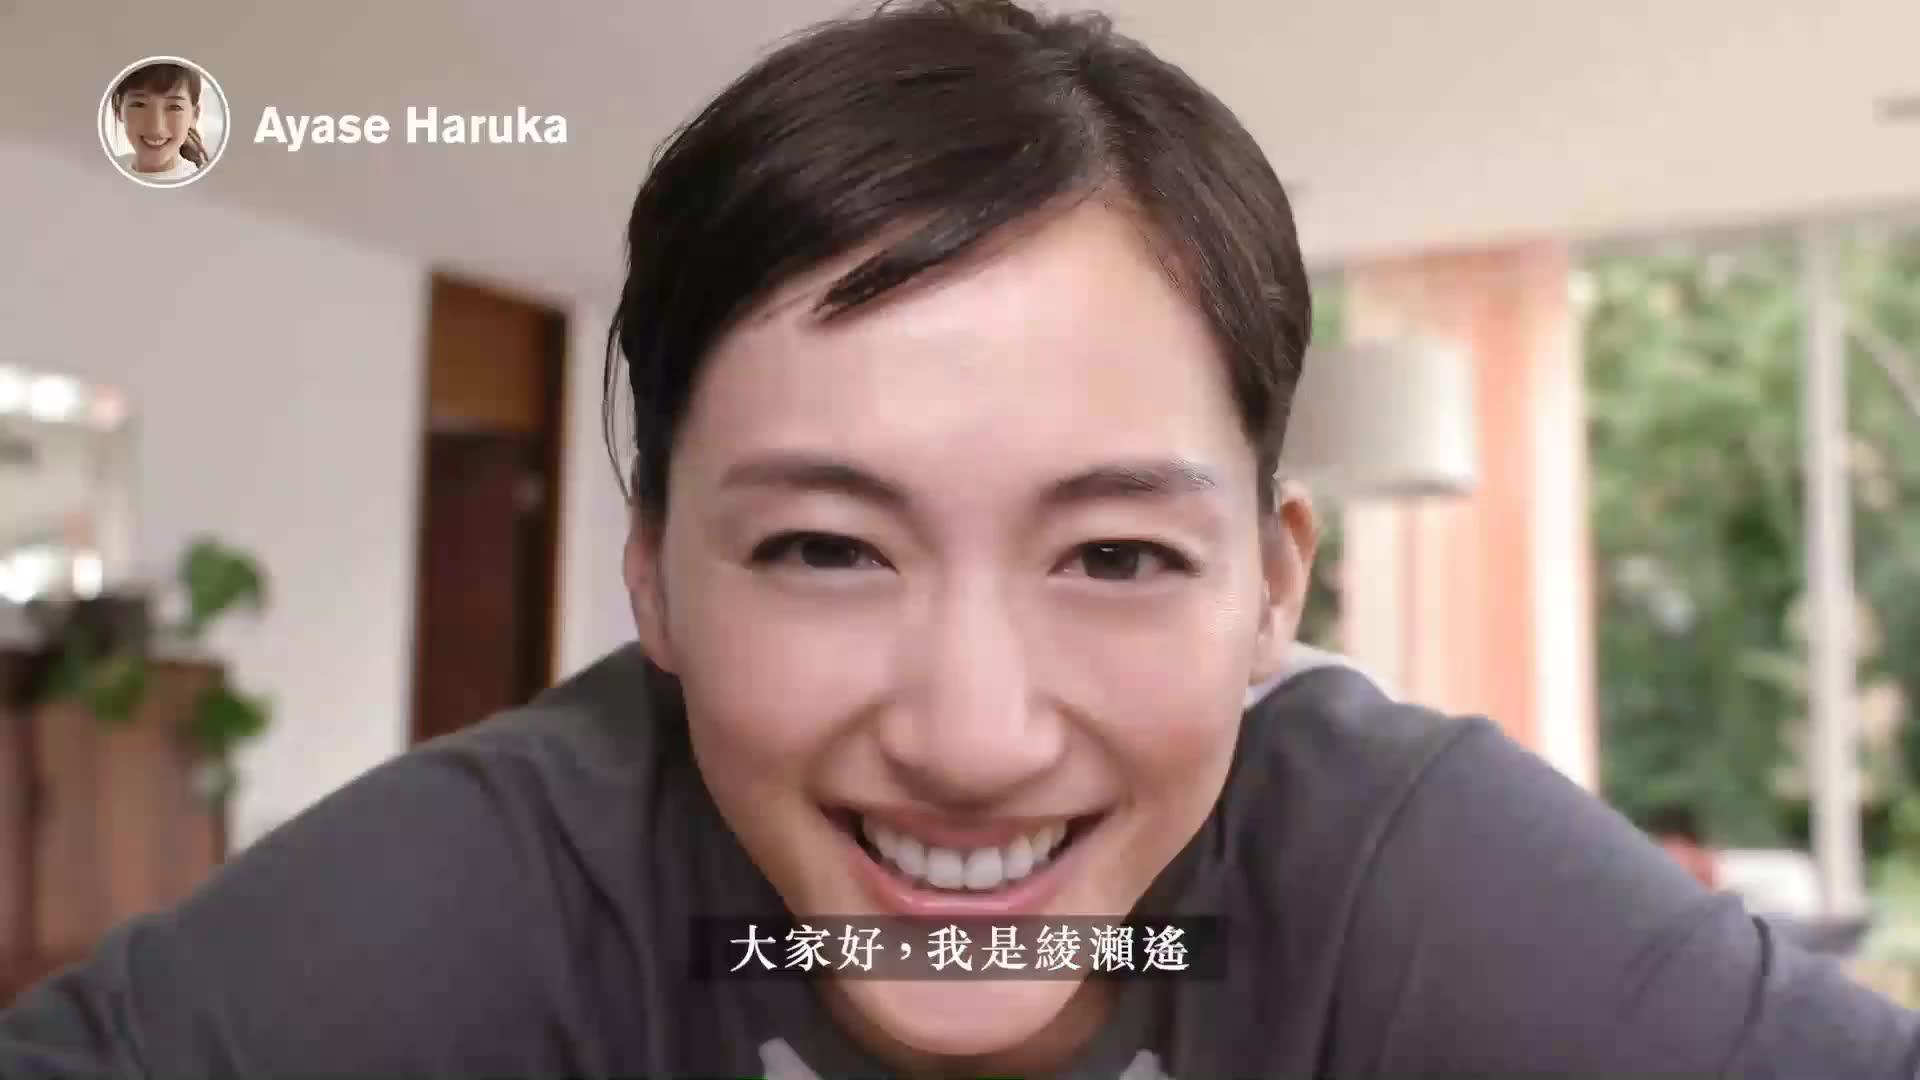 央视广告欣赏-SK-II